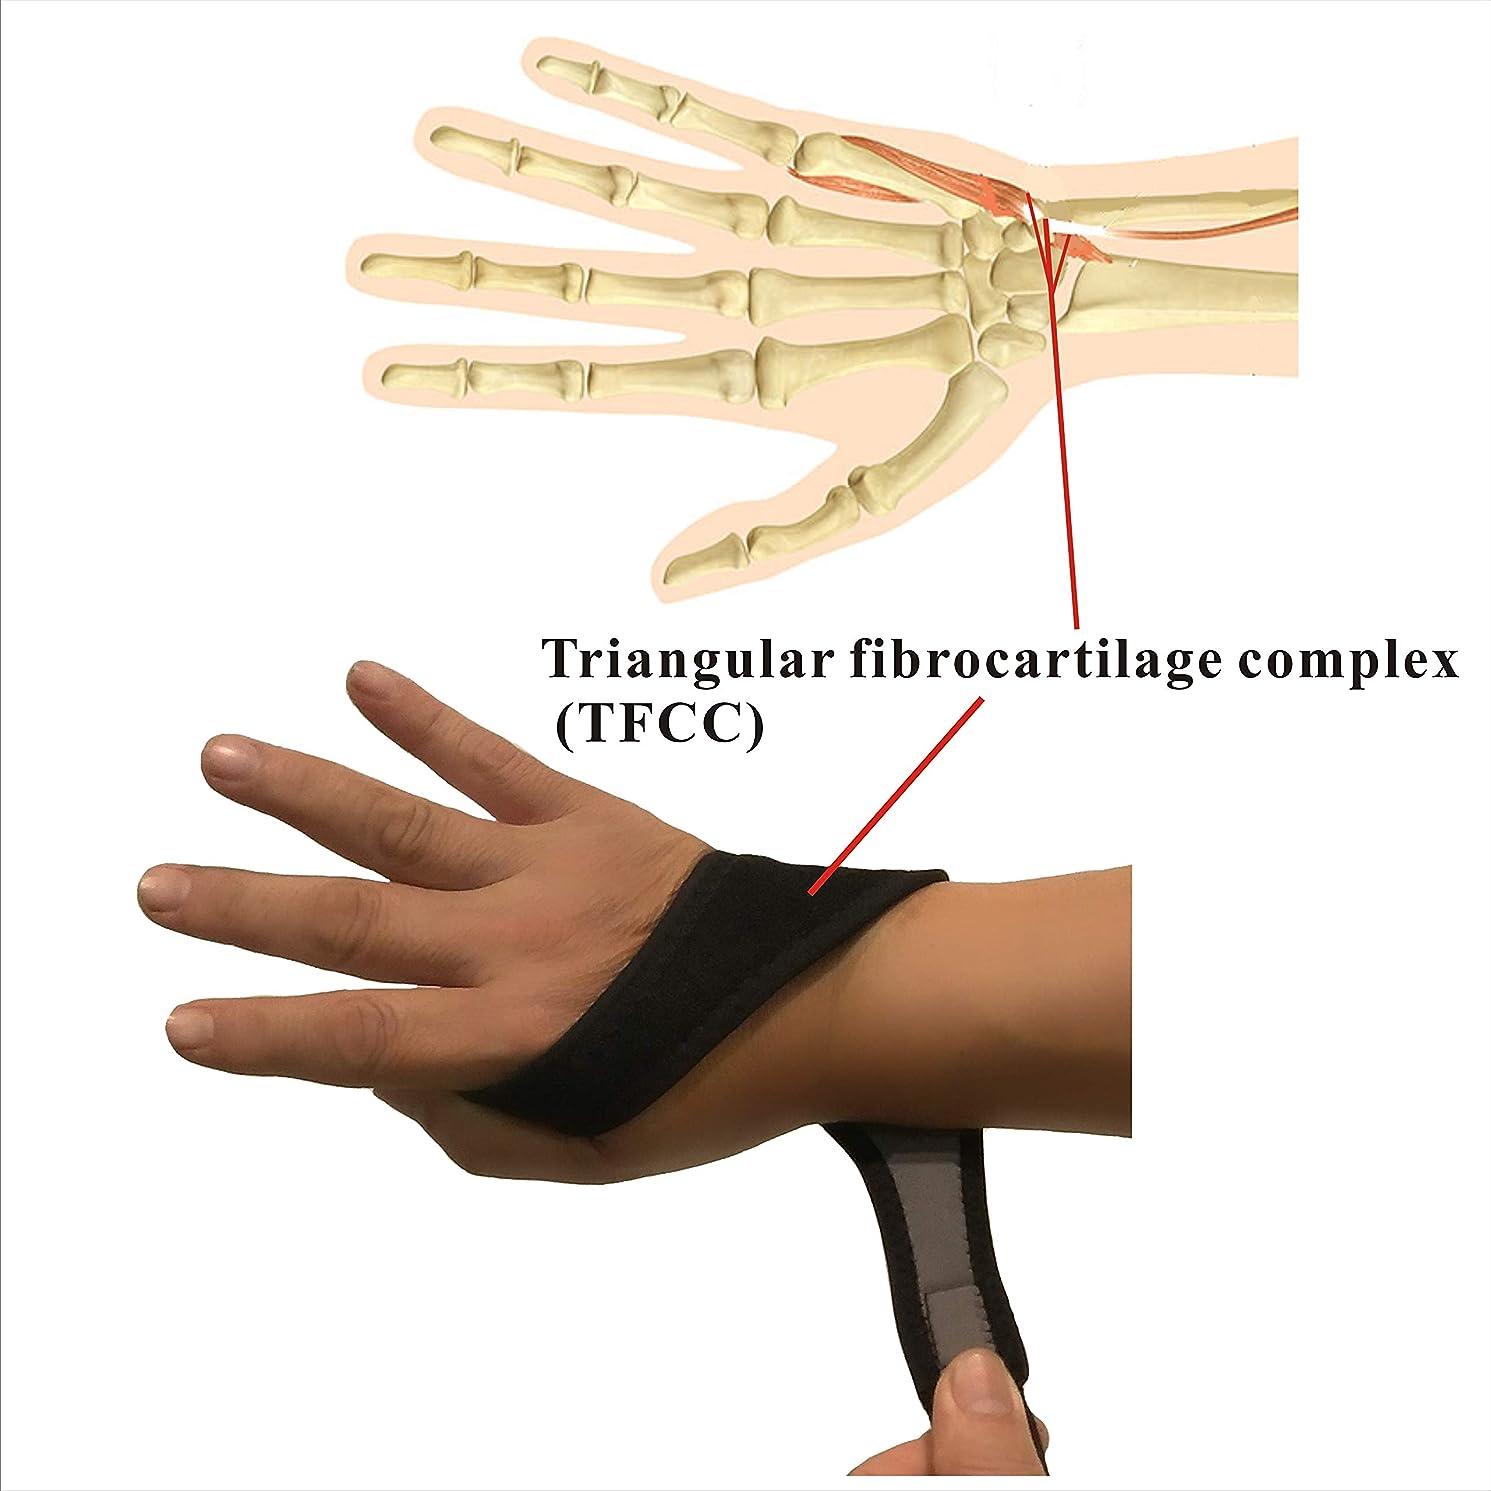 IRUFA,WR-OS-17,Breathable Neoprene Wrist Brace, for TFCC Tear- Triangular Fibrocartilage Complex Injuries, Ulnar Sided Wrist Pain, Weight Bearing Strain, One PCS (Neoprene)